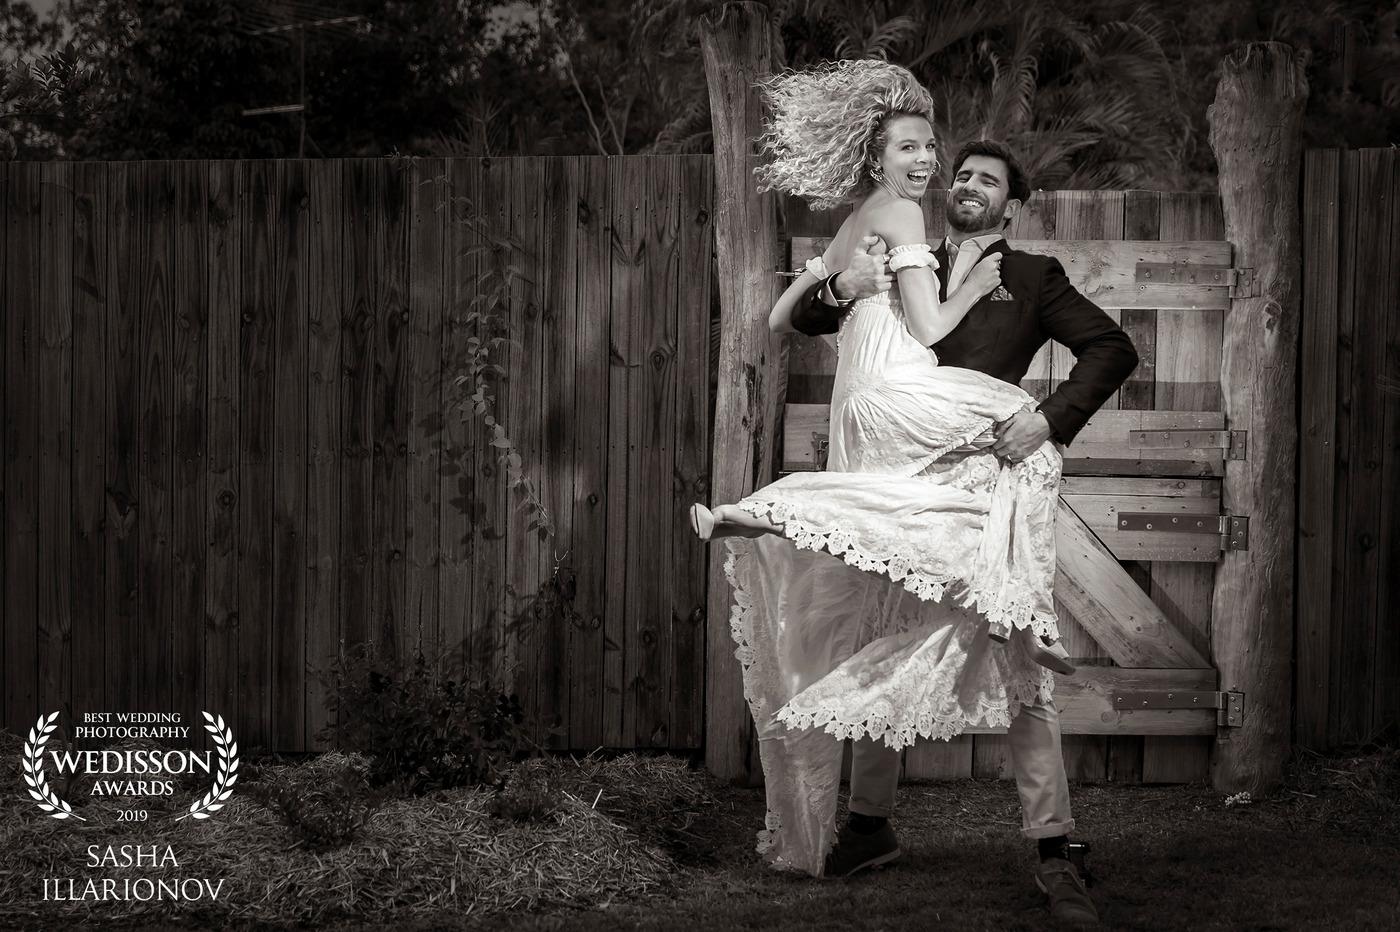 adelaide wedding photography award 05.jpg